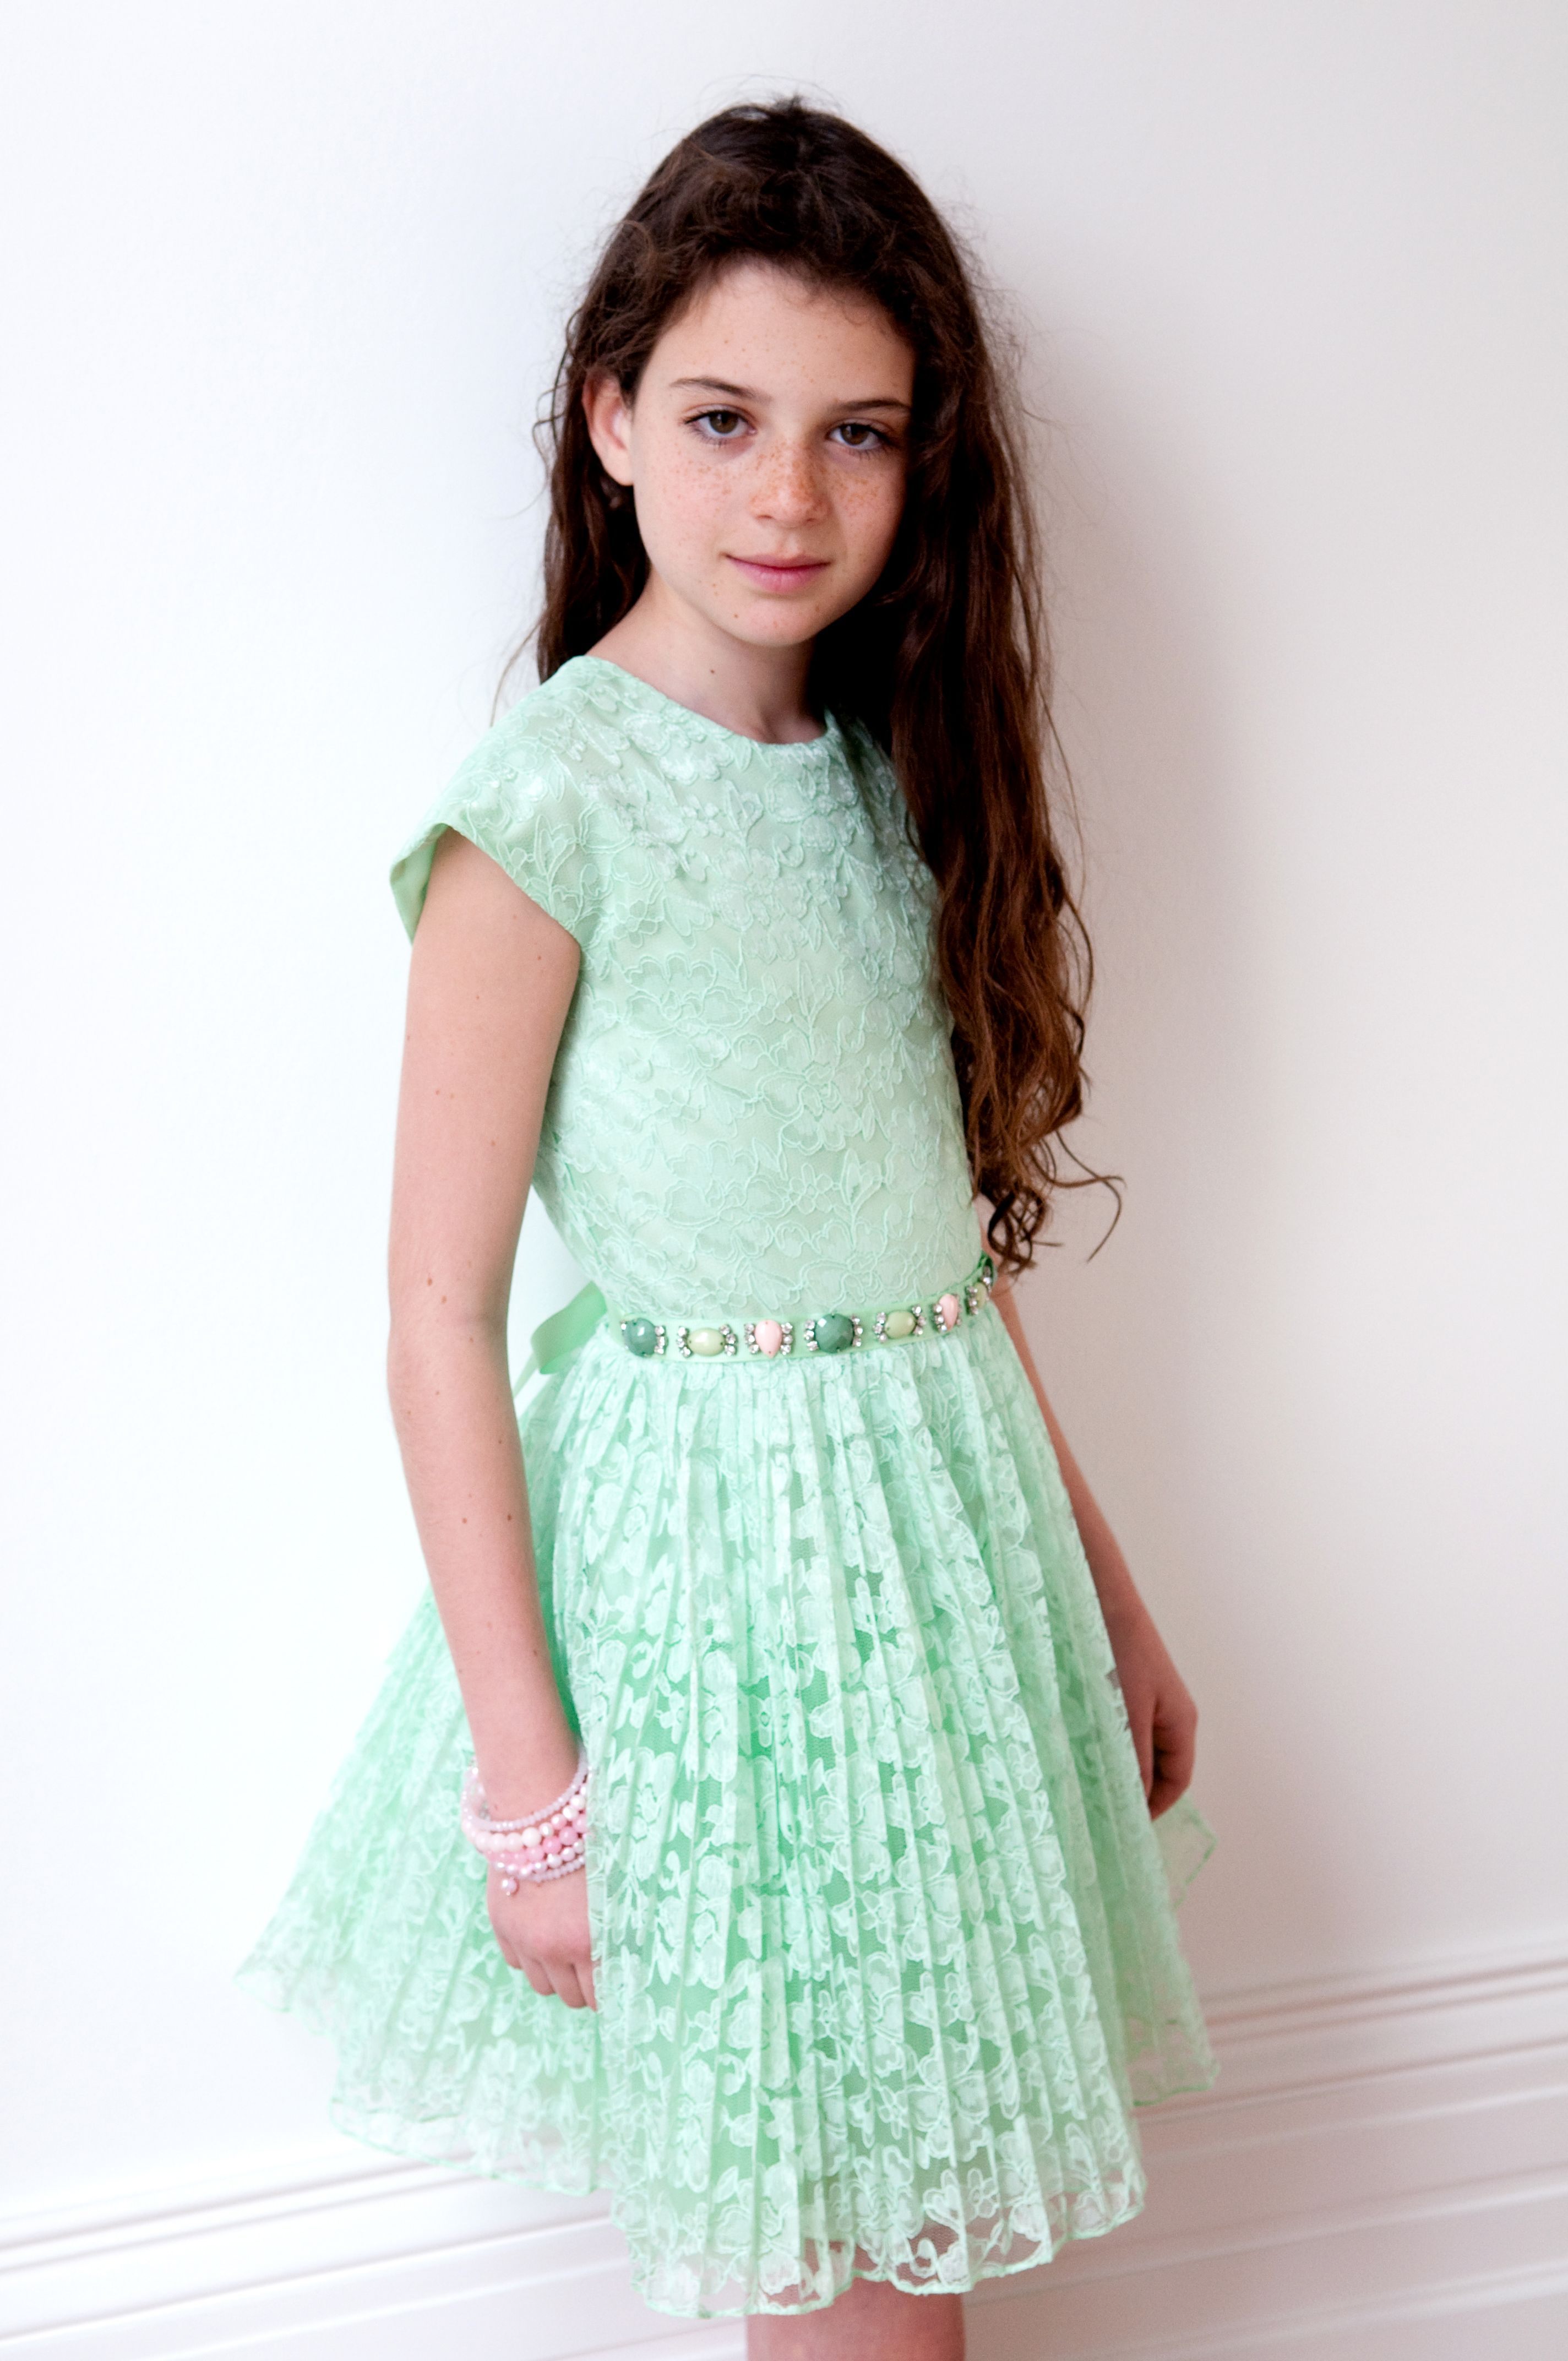 David Charles Style 1108GG   Vestidos para niñas, Vestidos ...